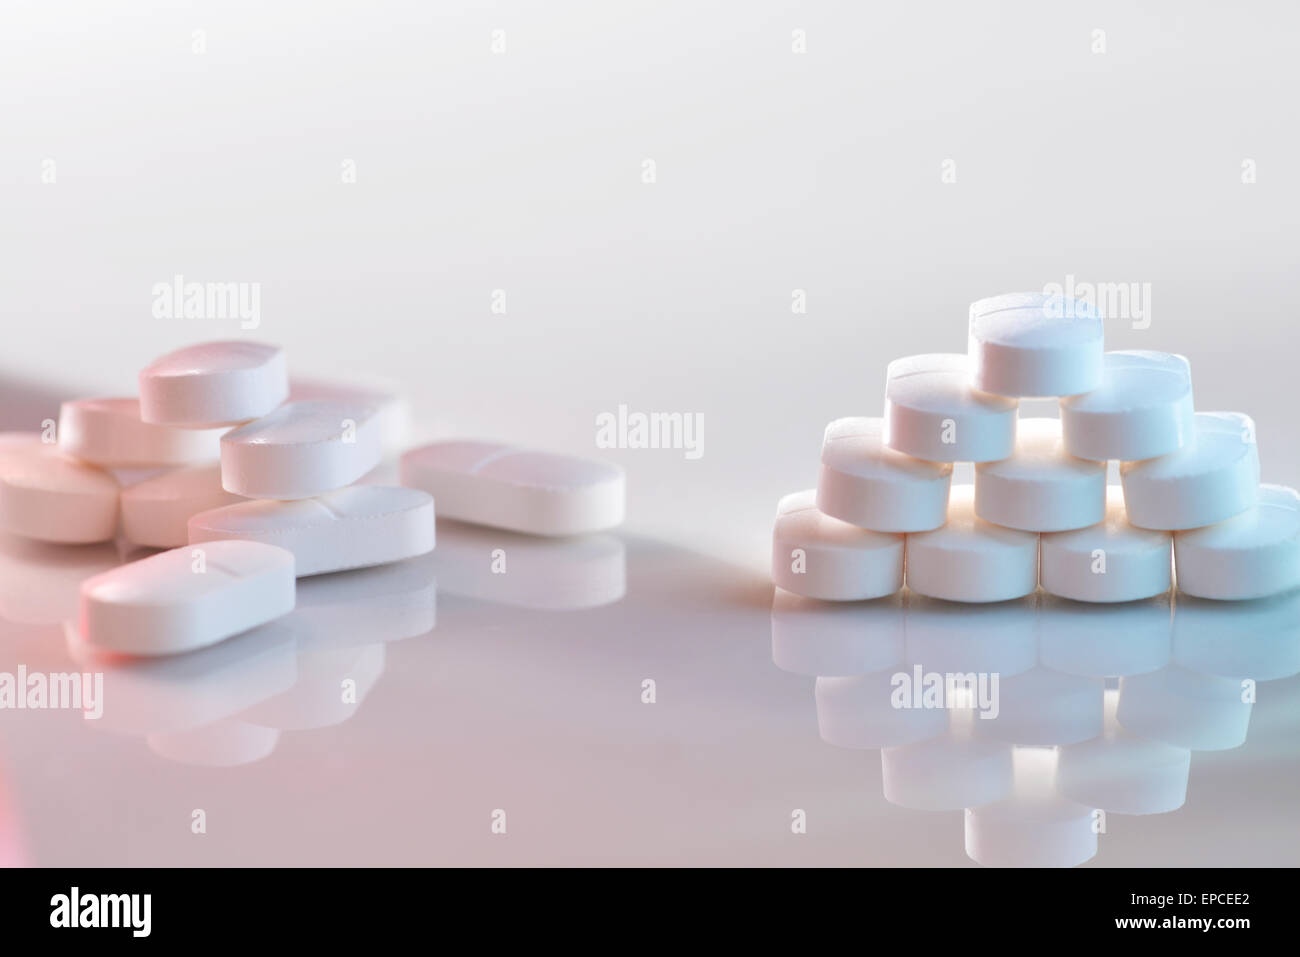 Paracetamol tablets - Stock Image